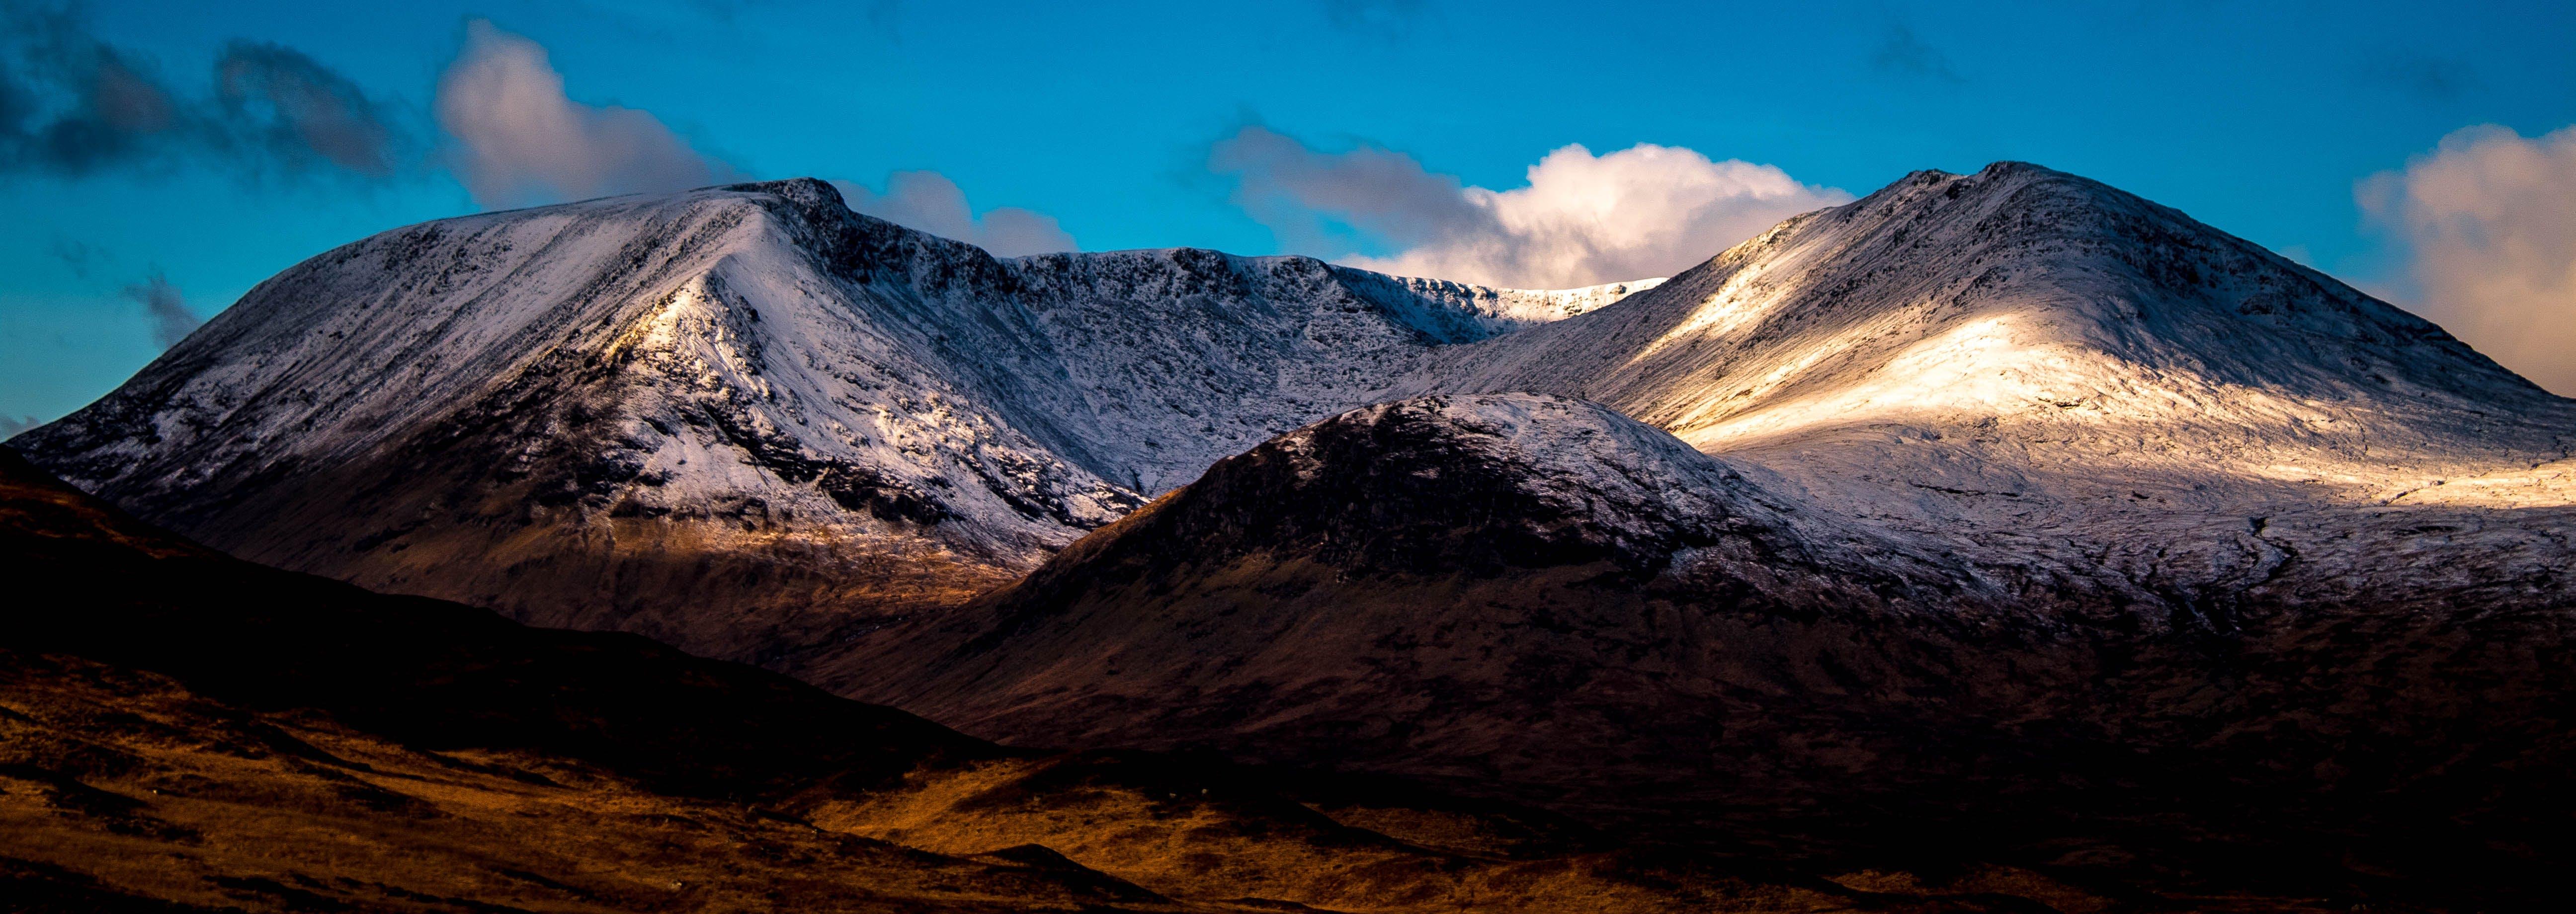 Free stock photo of snow, landscape, mountain, outside